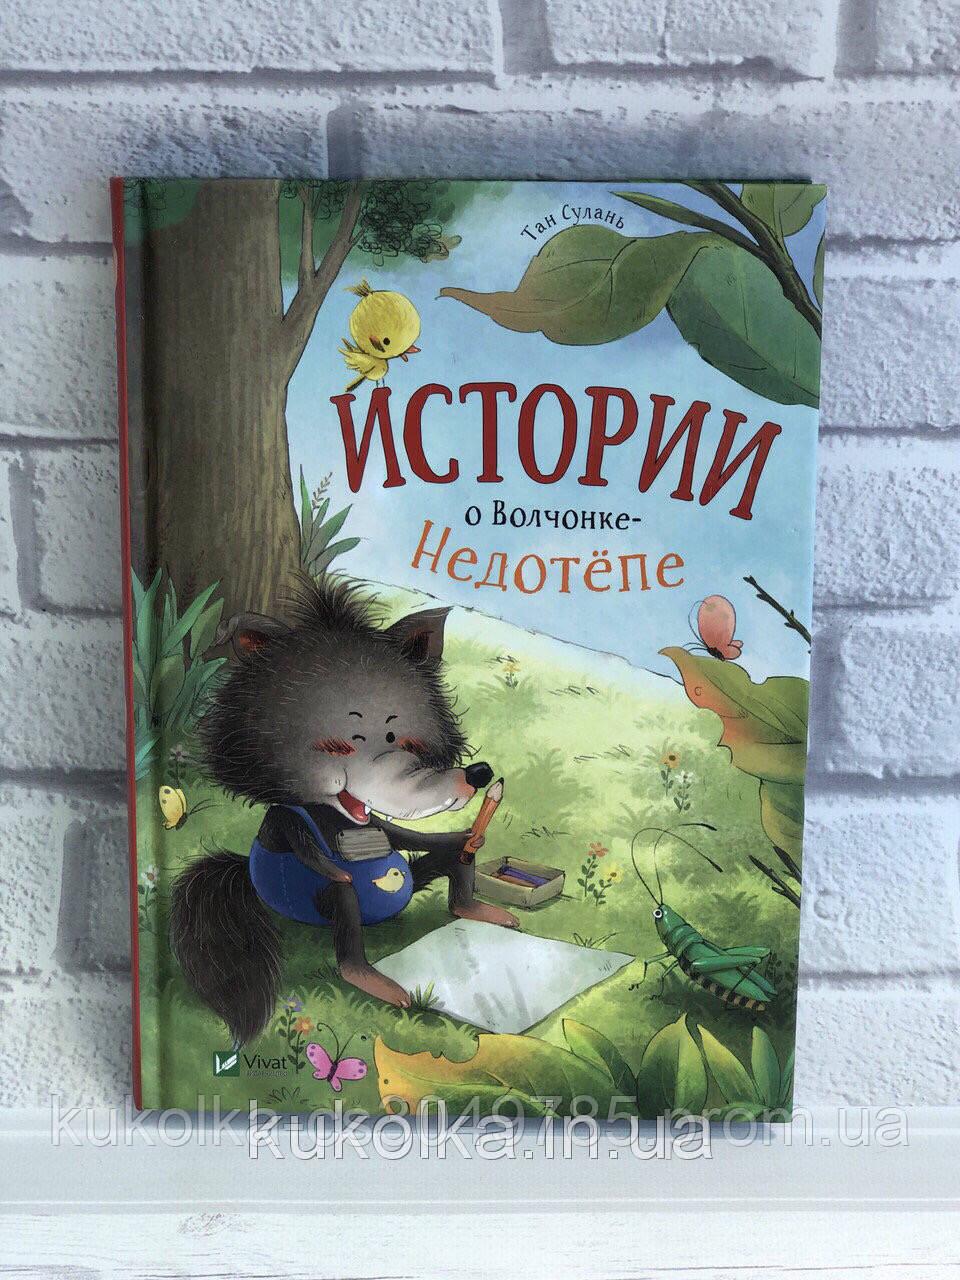 « Истории о Волчонке-Недотепе »  Тан Сулань